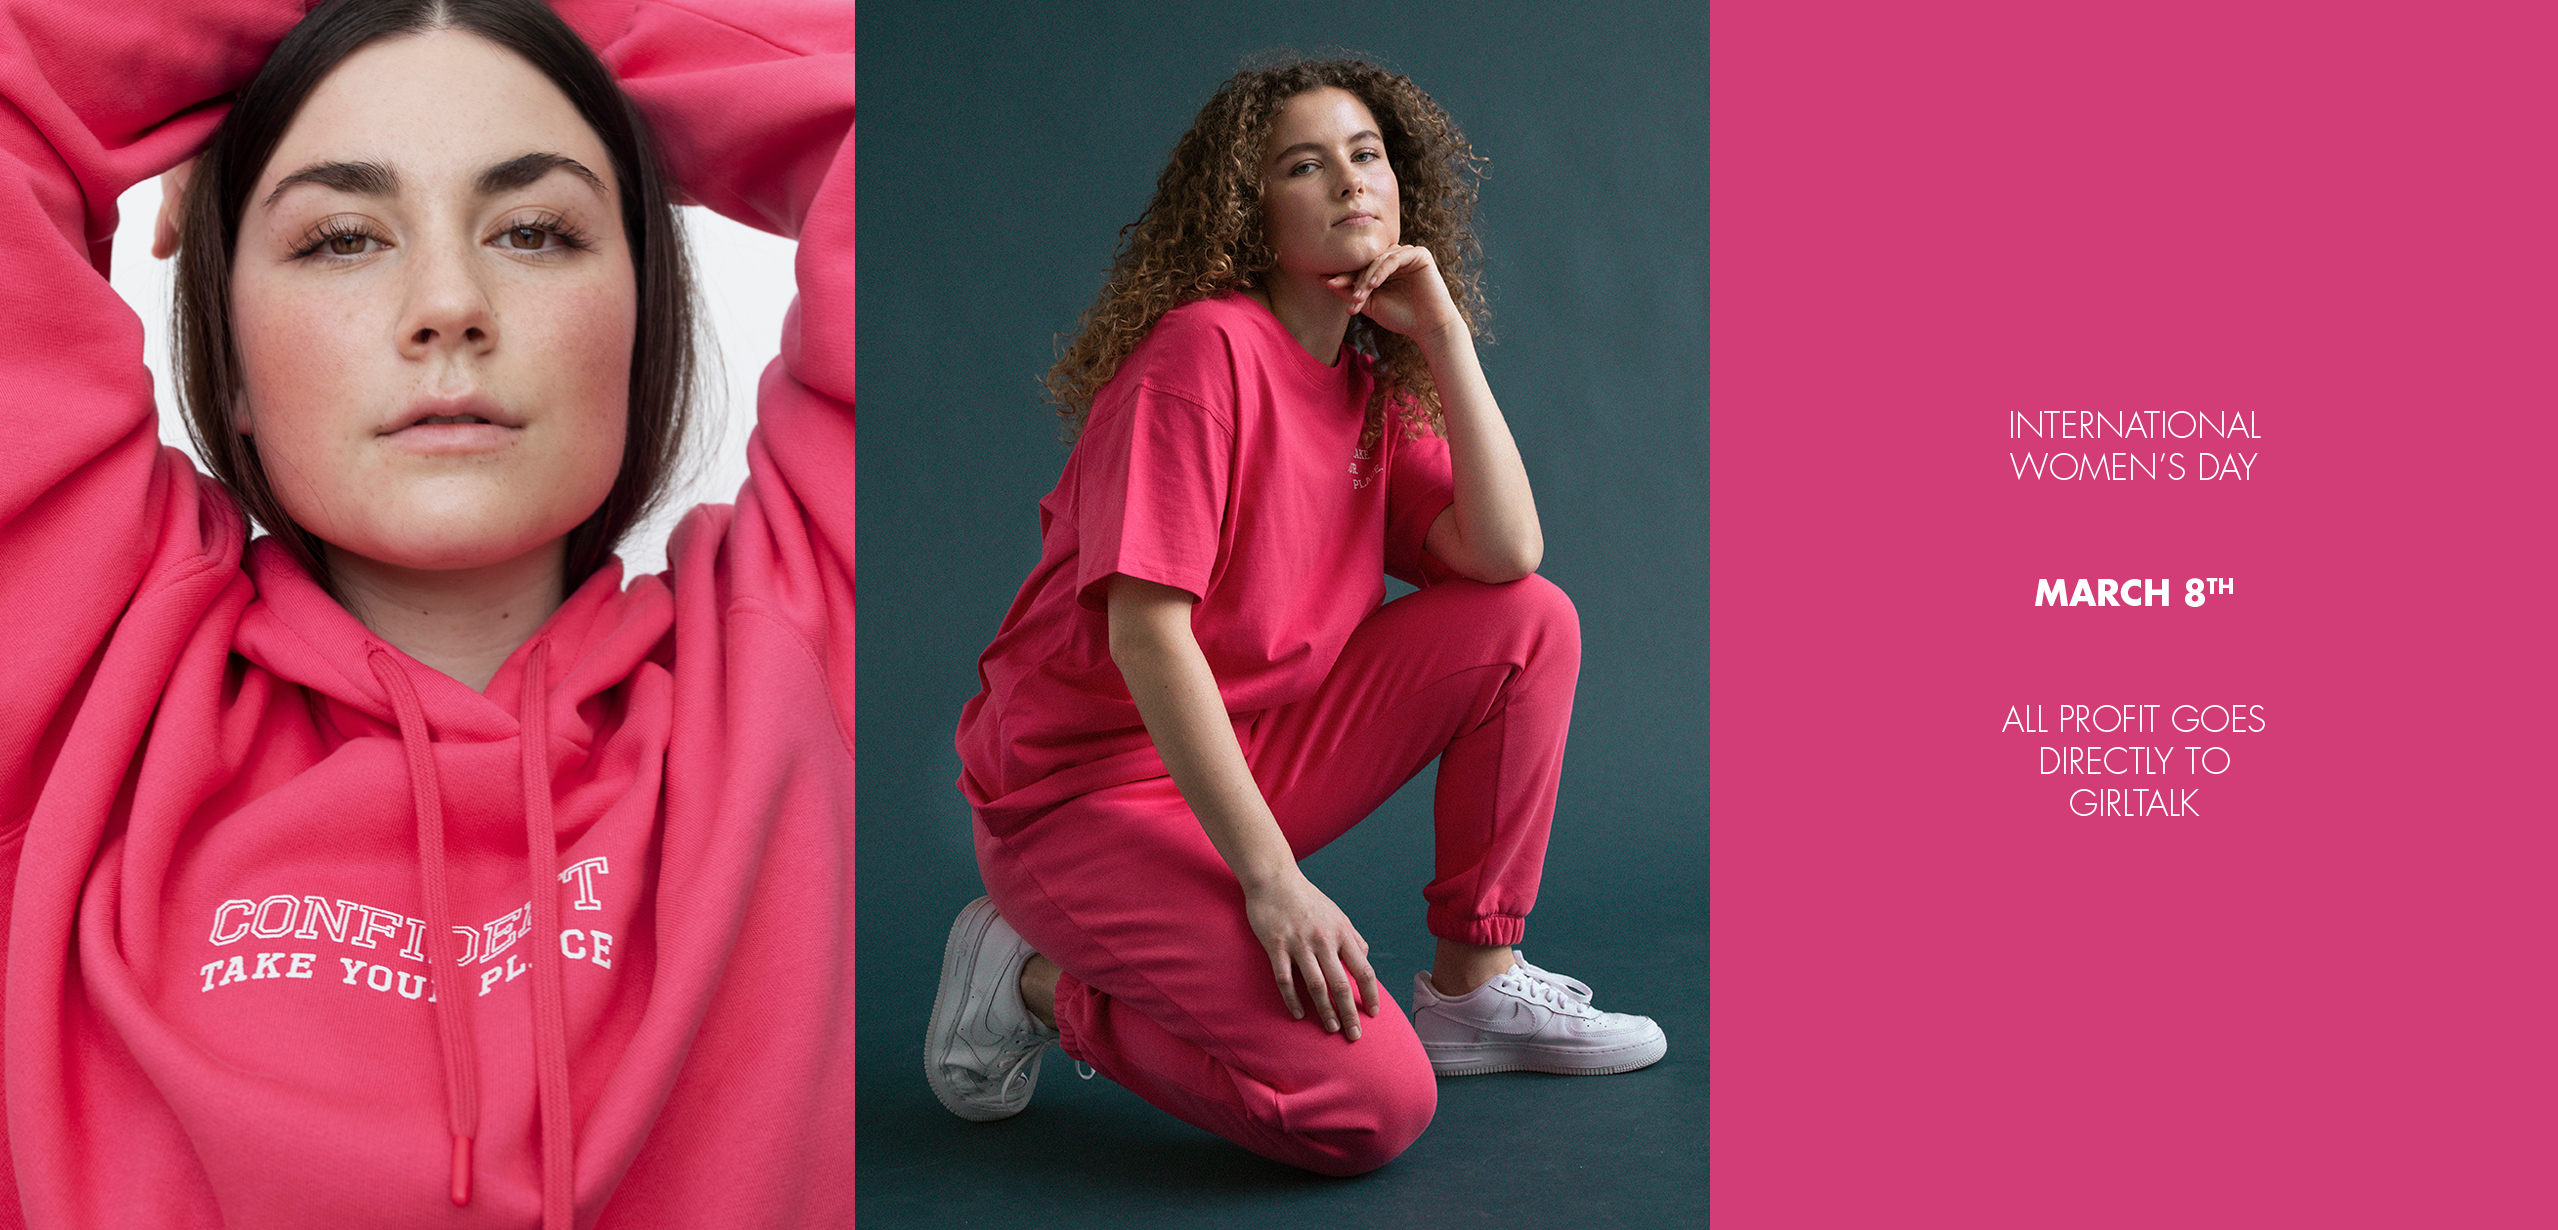 Envii x Girltalk Women's fashion